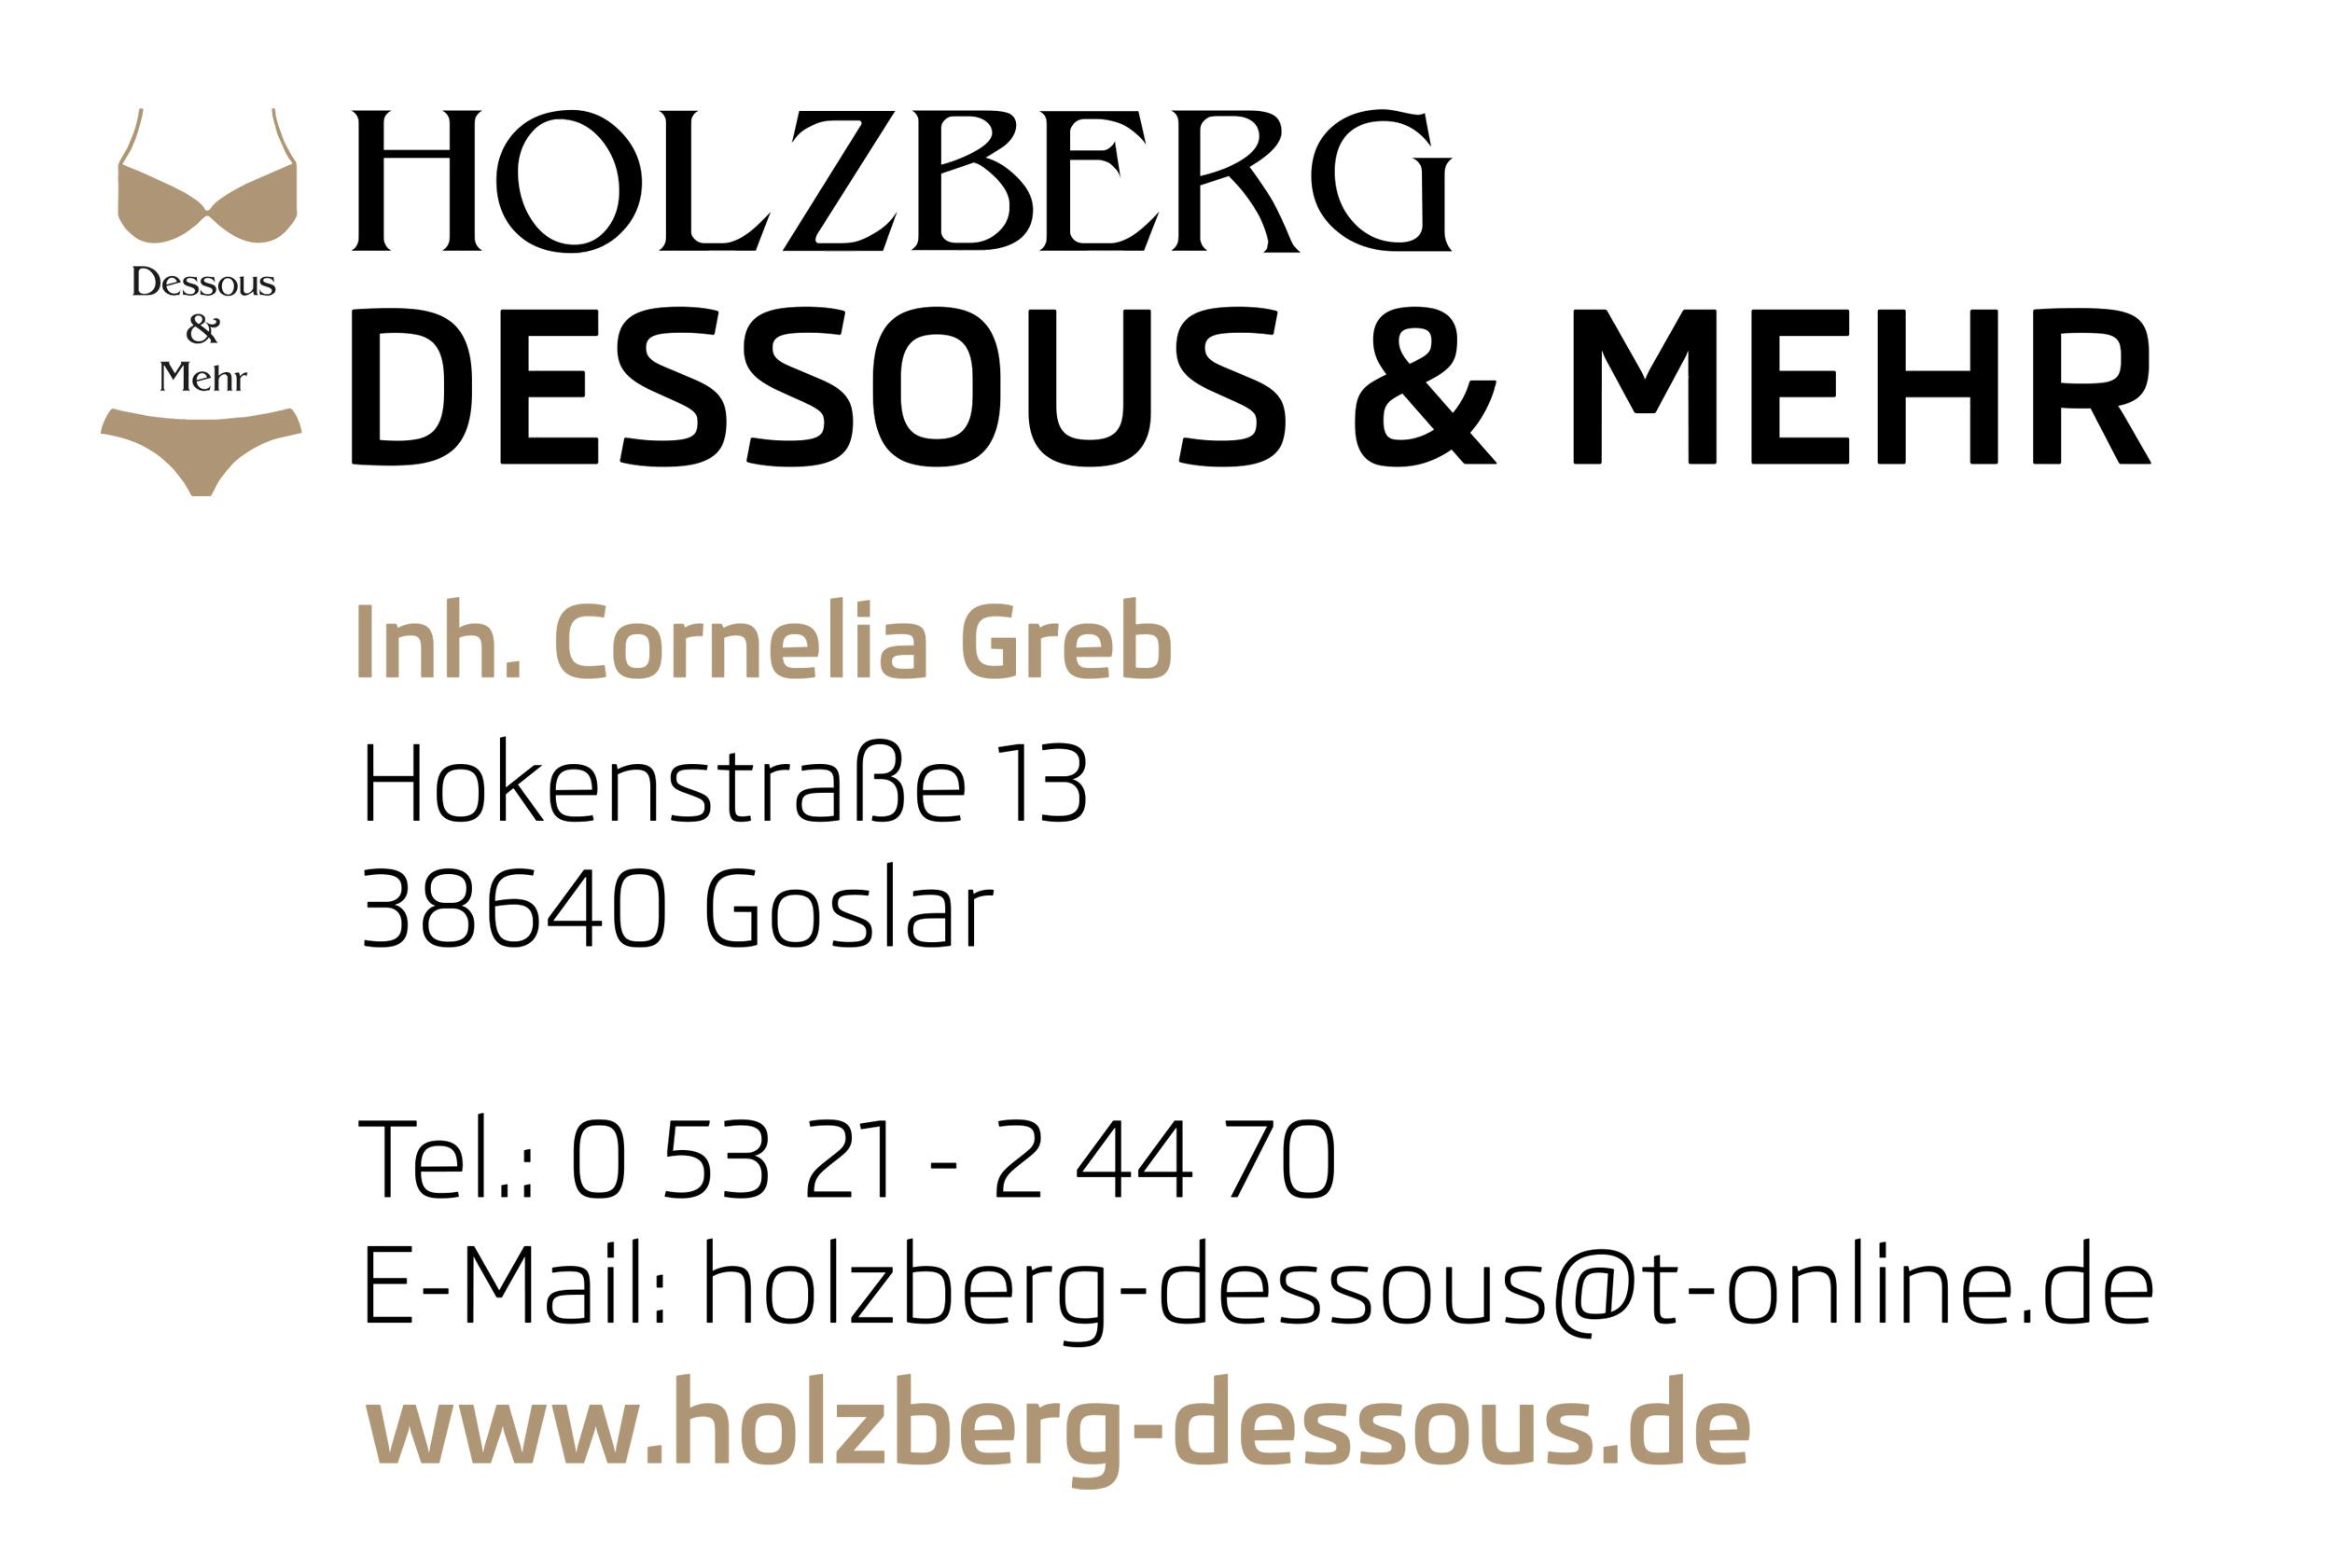 Holzberg Dessous & Mehr